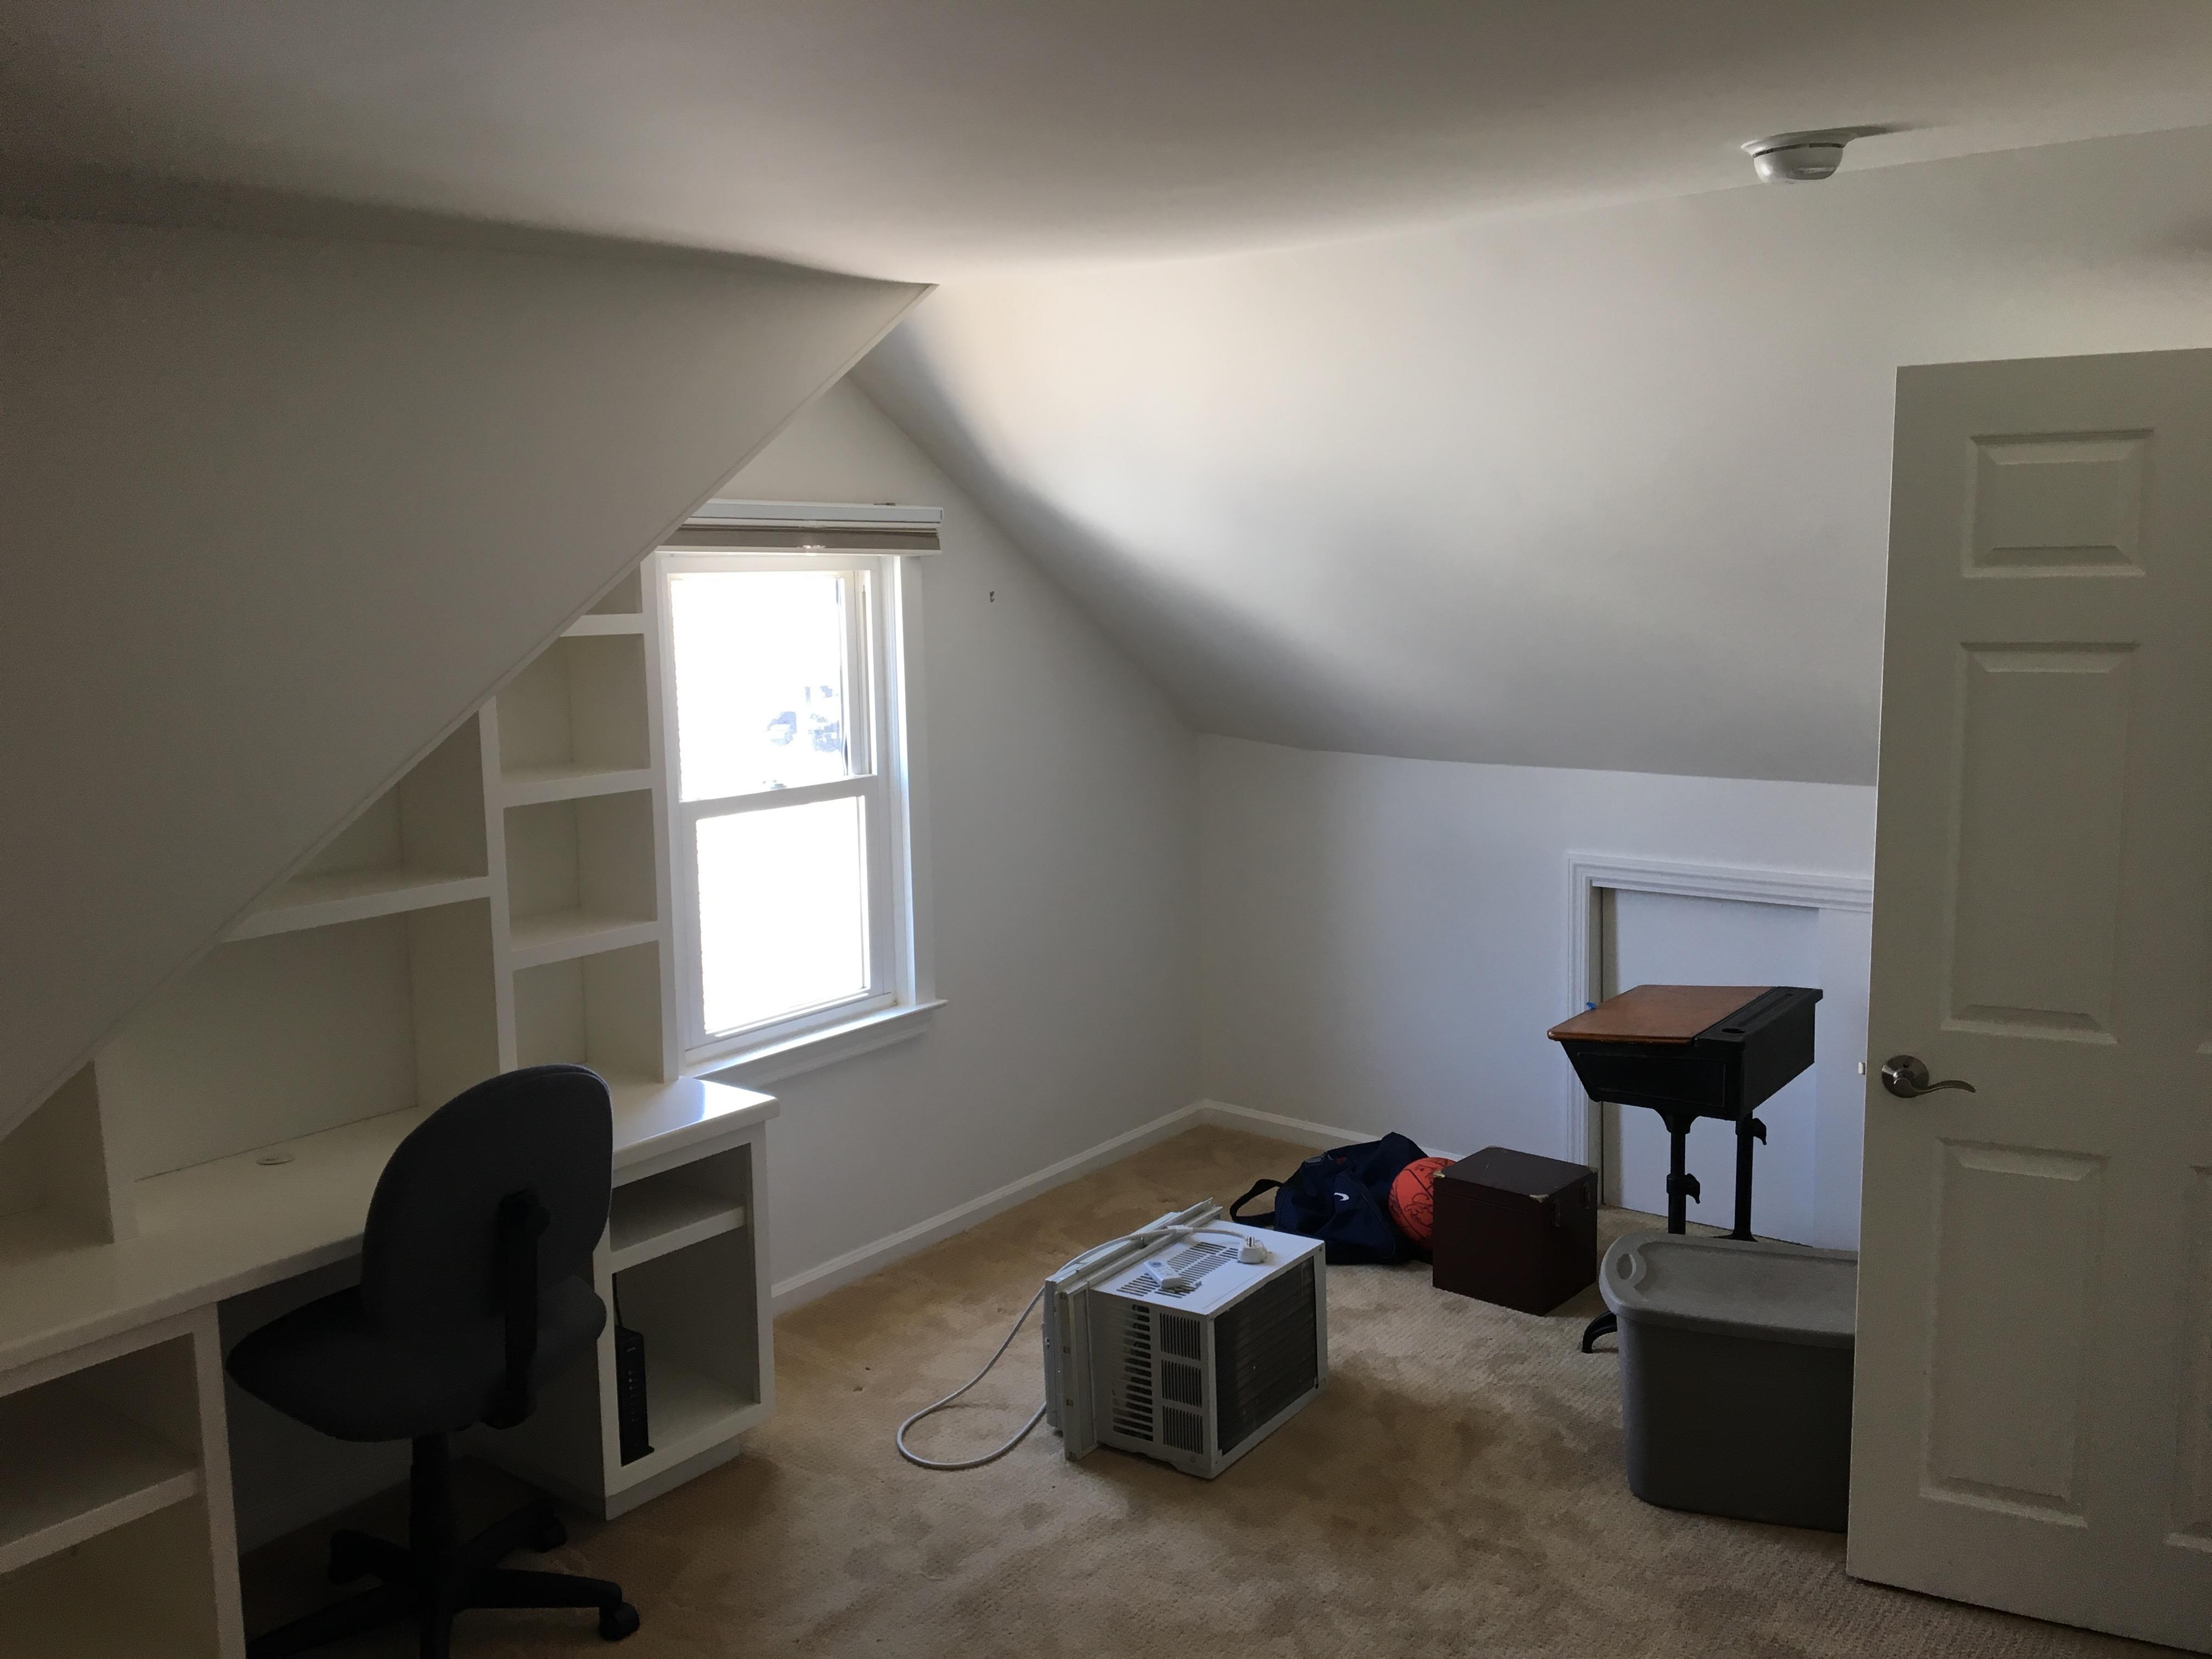 Bedroom 3 Before